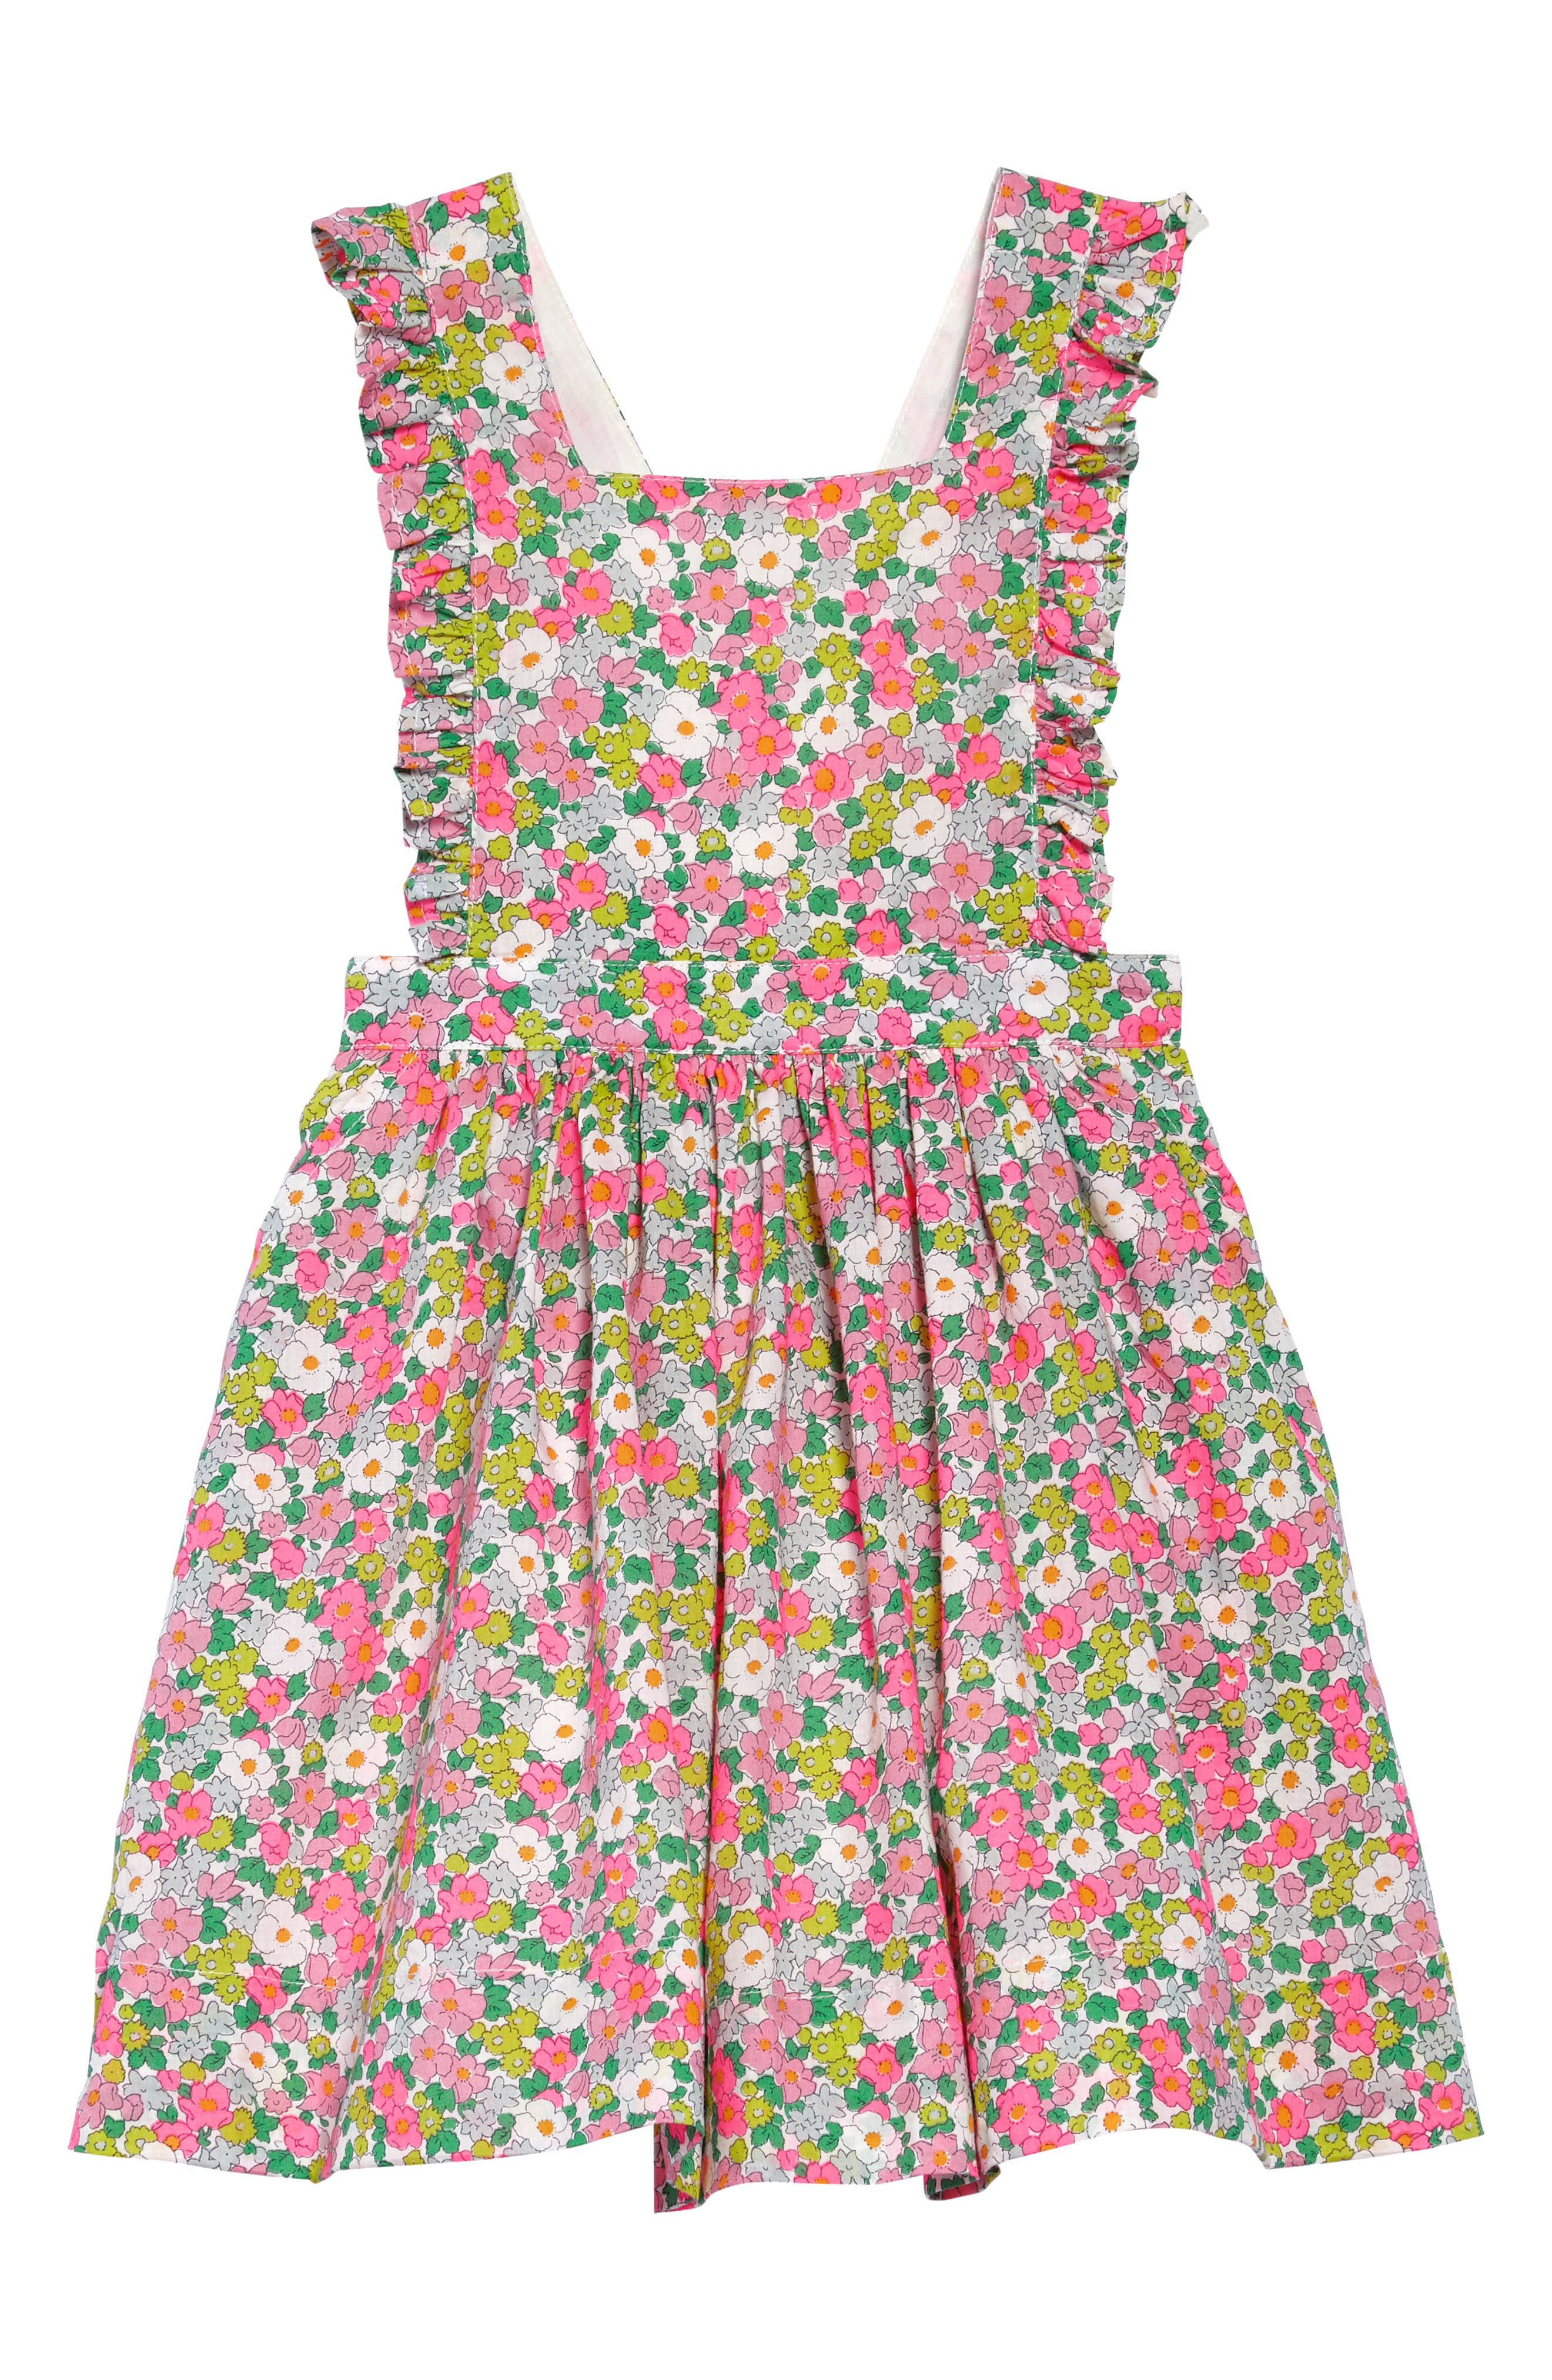 Main Image - Mini Boden Frill Cross Back Woven Dress (Toddler Girls, Little Girls & Big Girls)